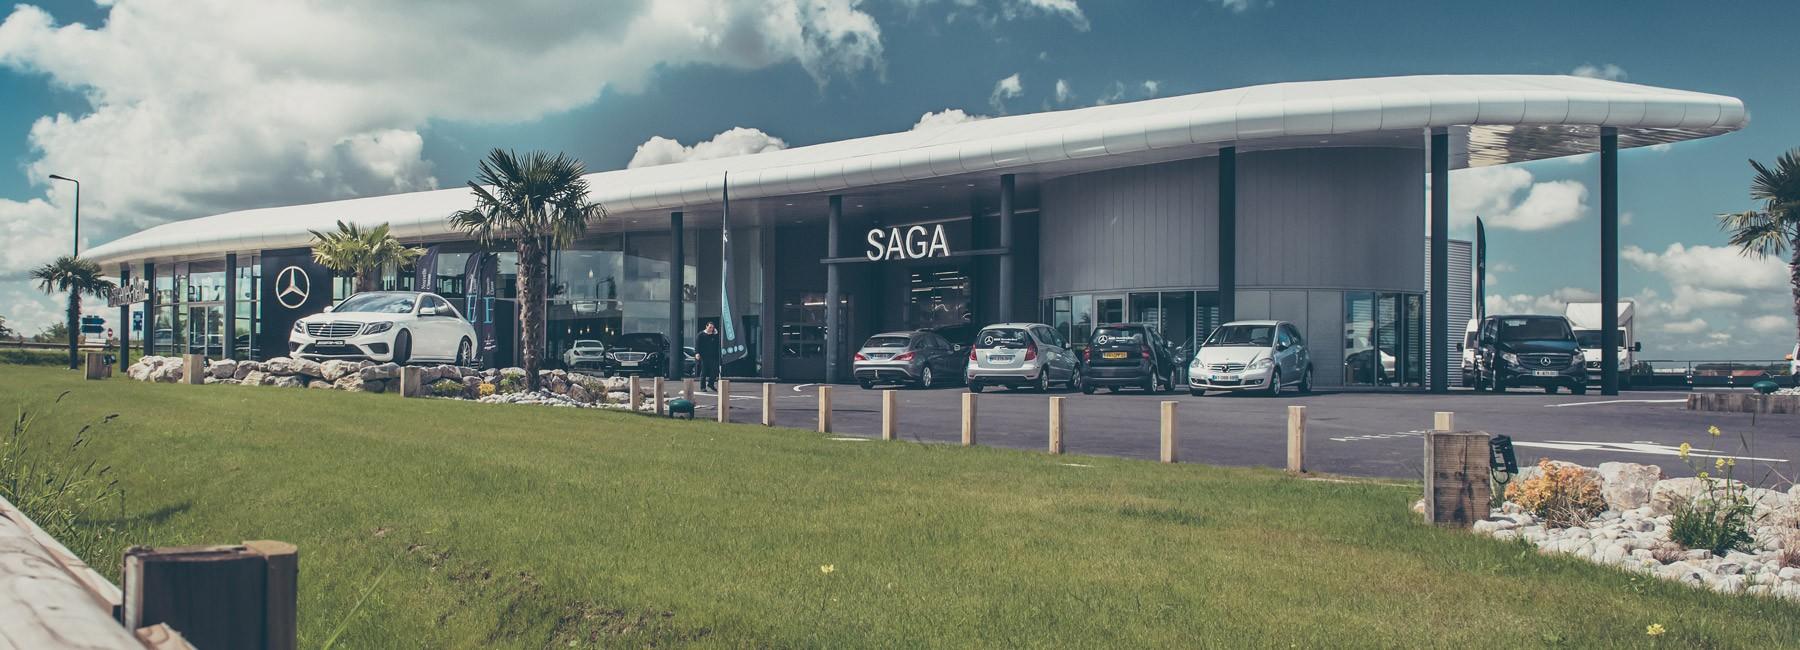 SAGA Valenciennes